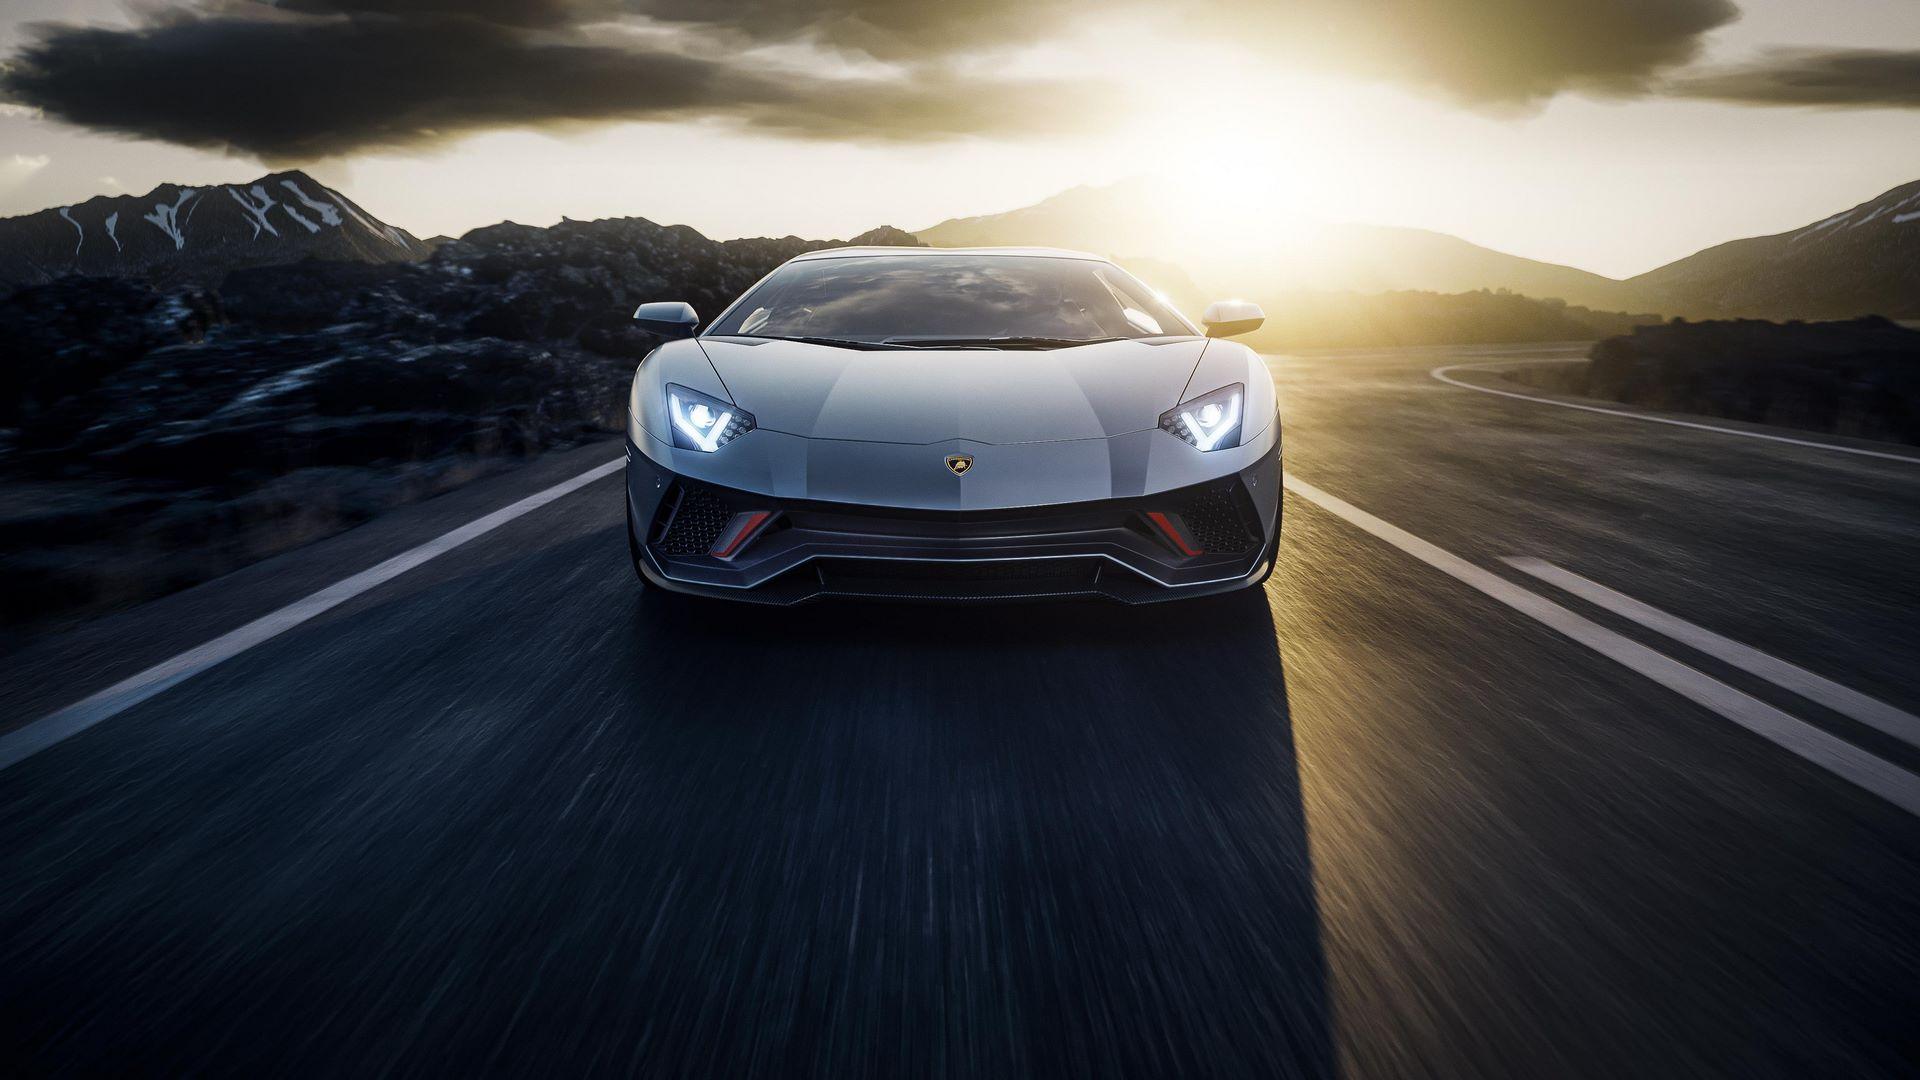 Lamborghini-Aventador-LP780-4-Ultimae-8